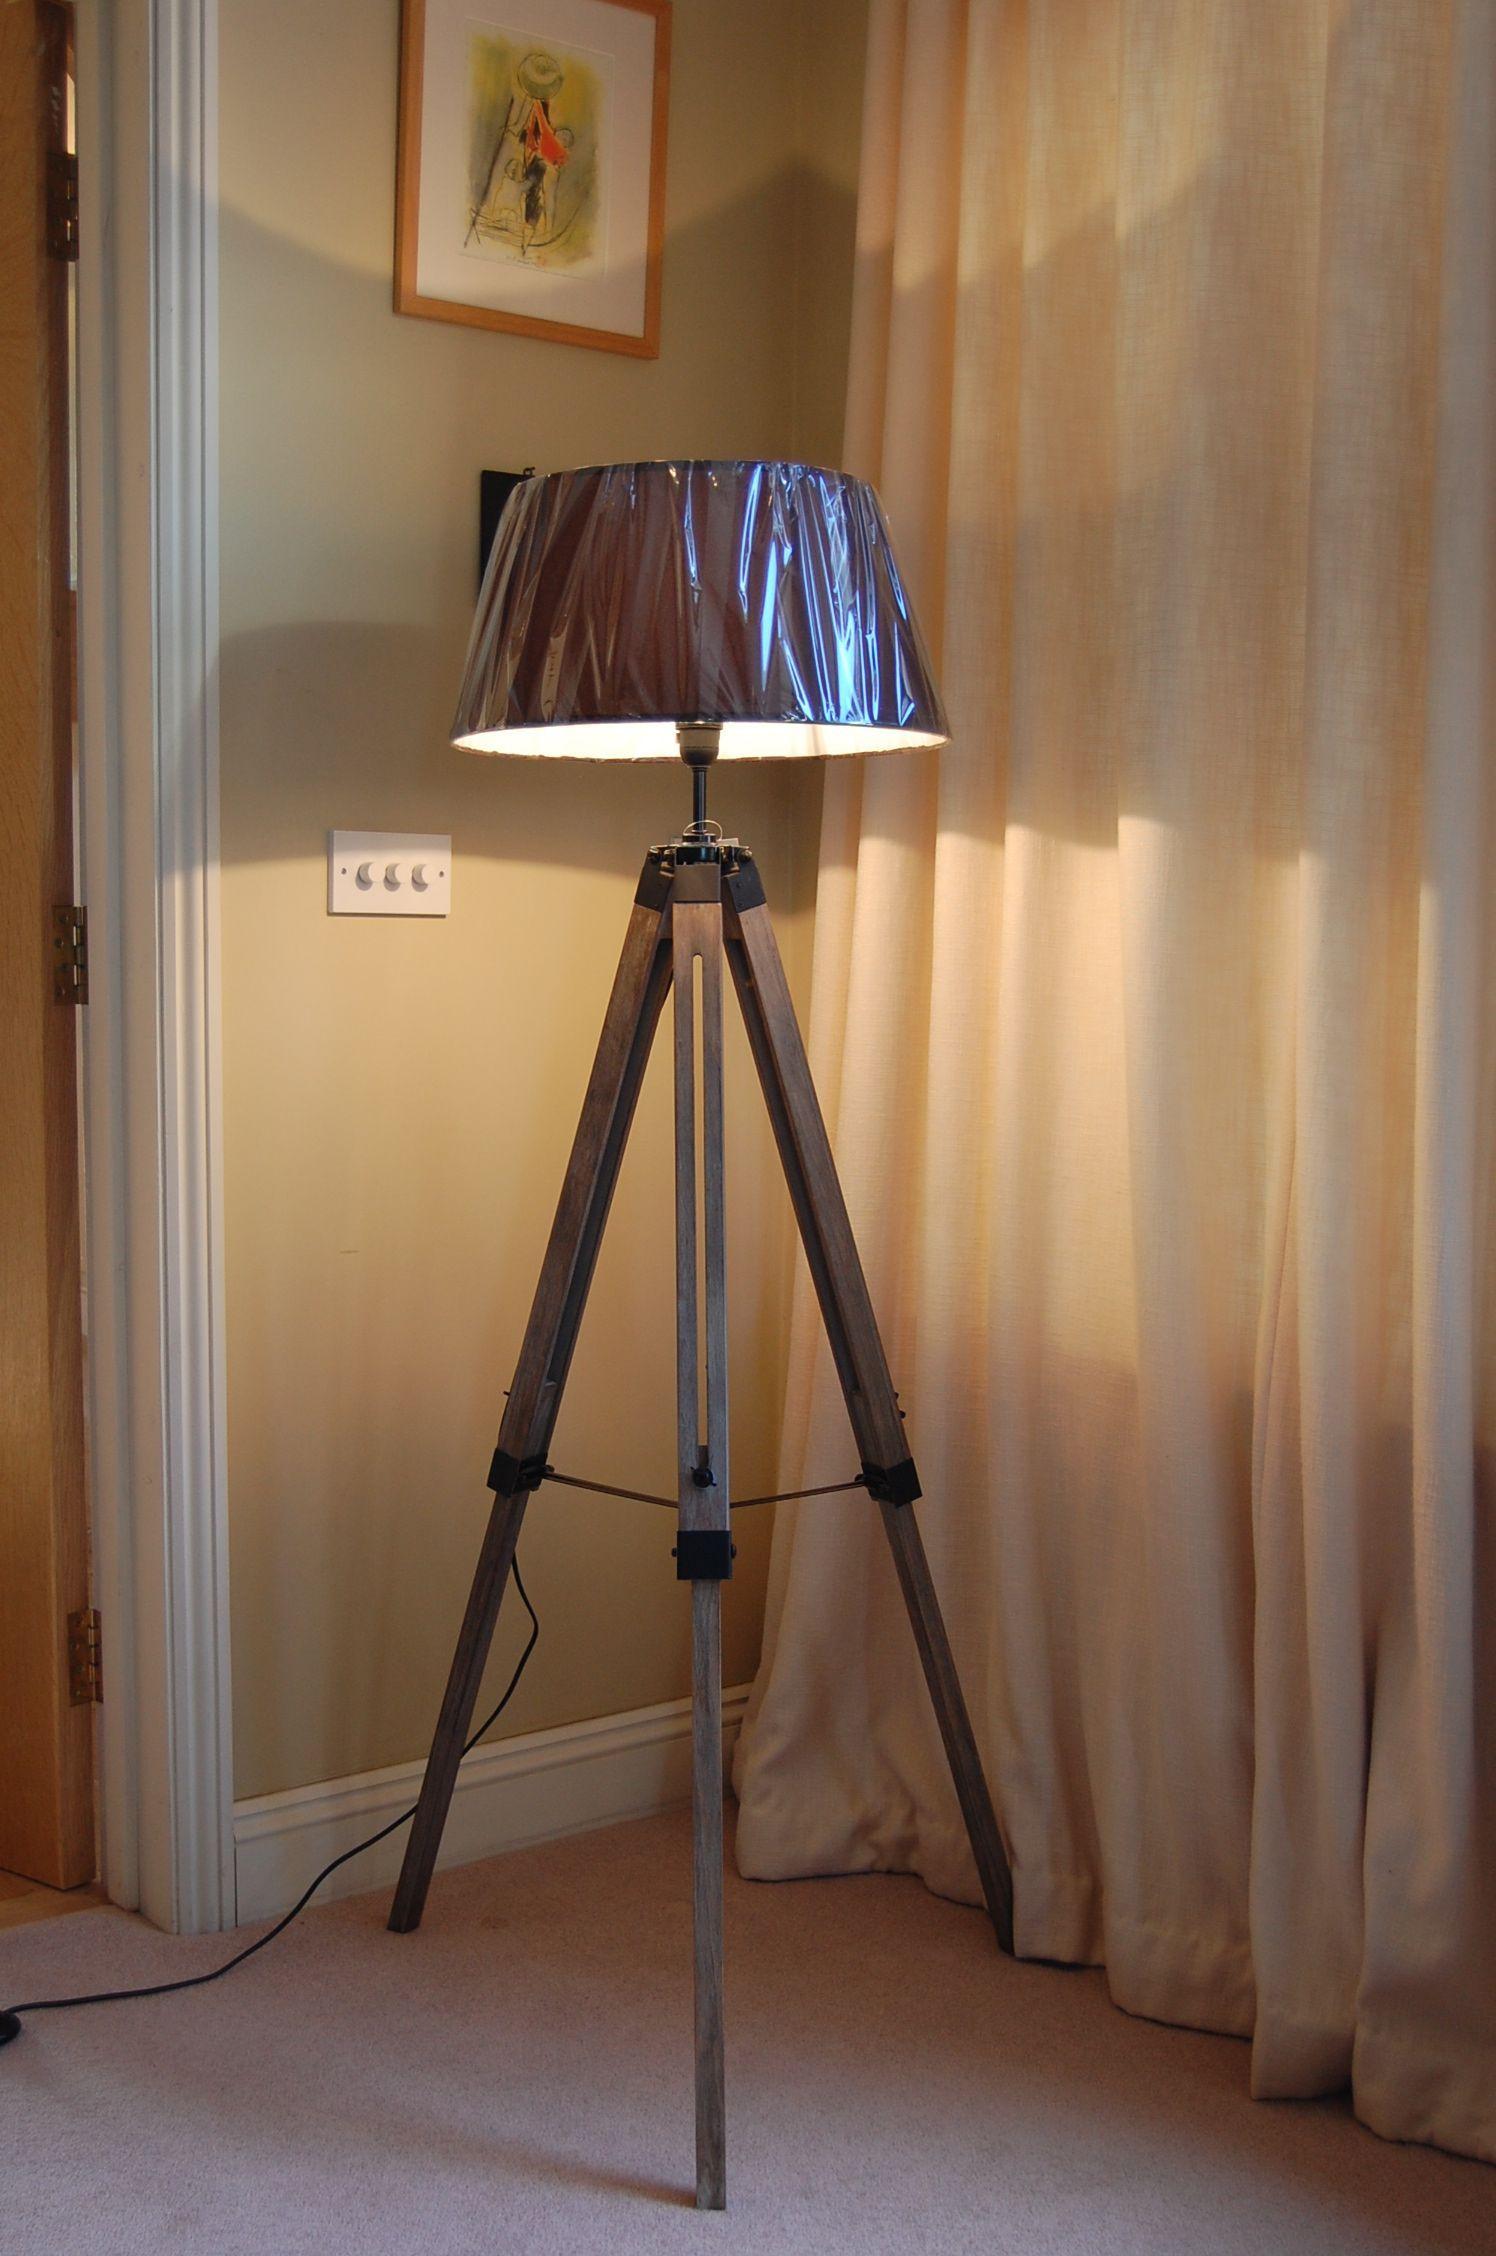 Tripod Floor Lamps Ideas Home Lighting Design Home Lighting